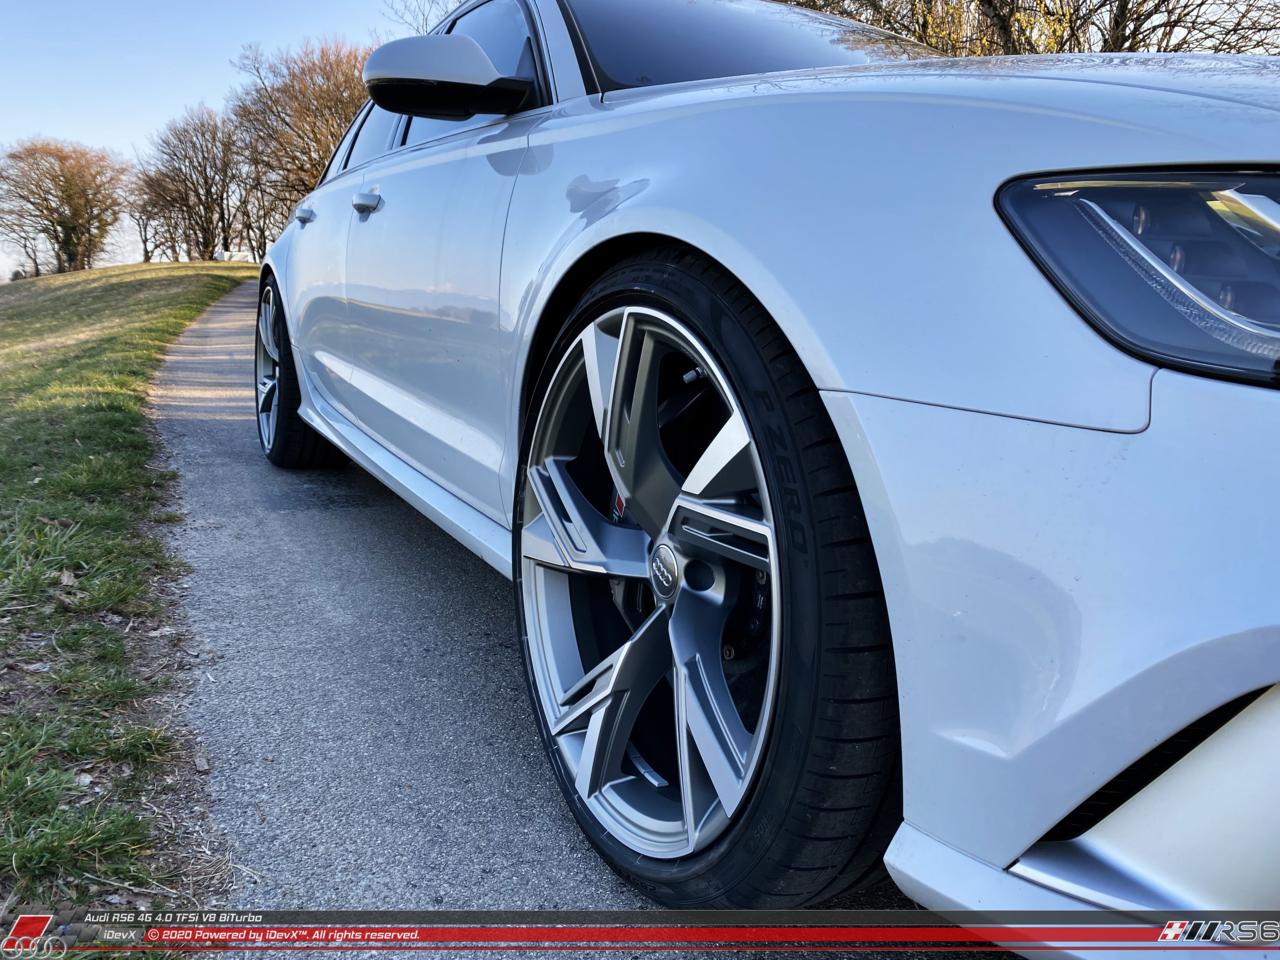 18.03.2020_Audi-RS6_iDevX_012.png